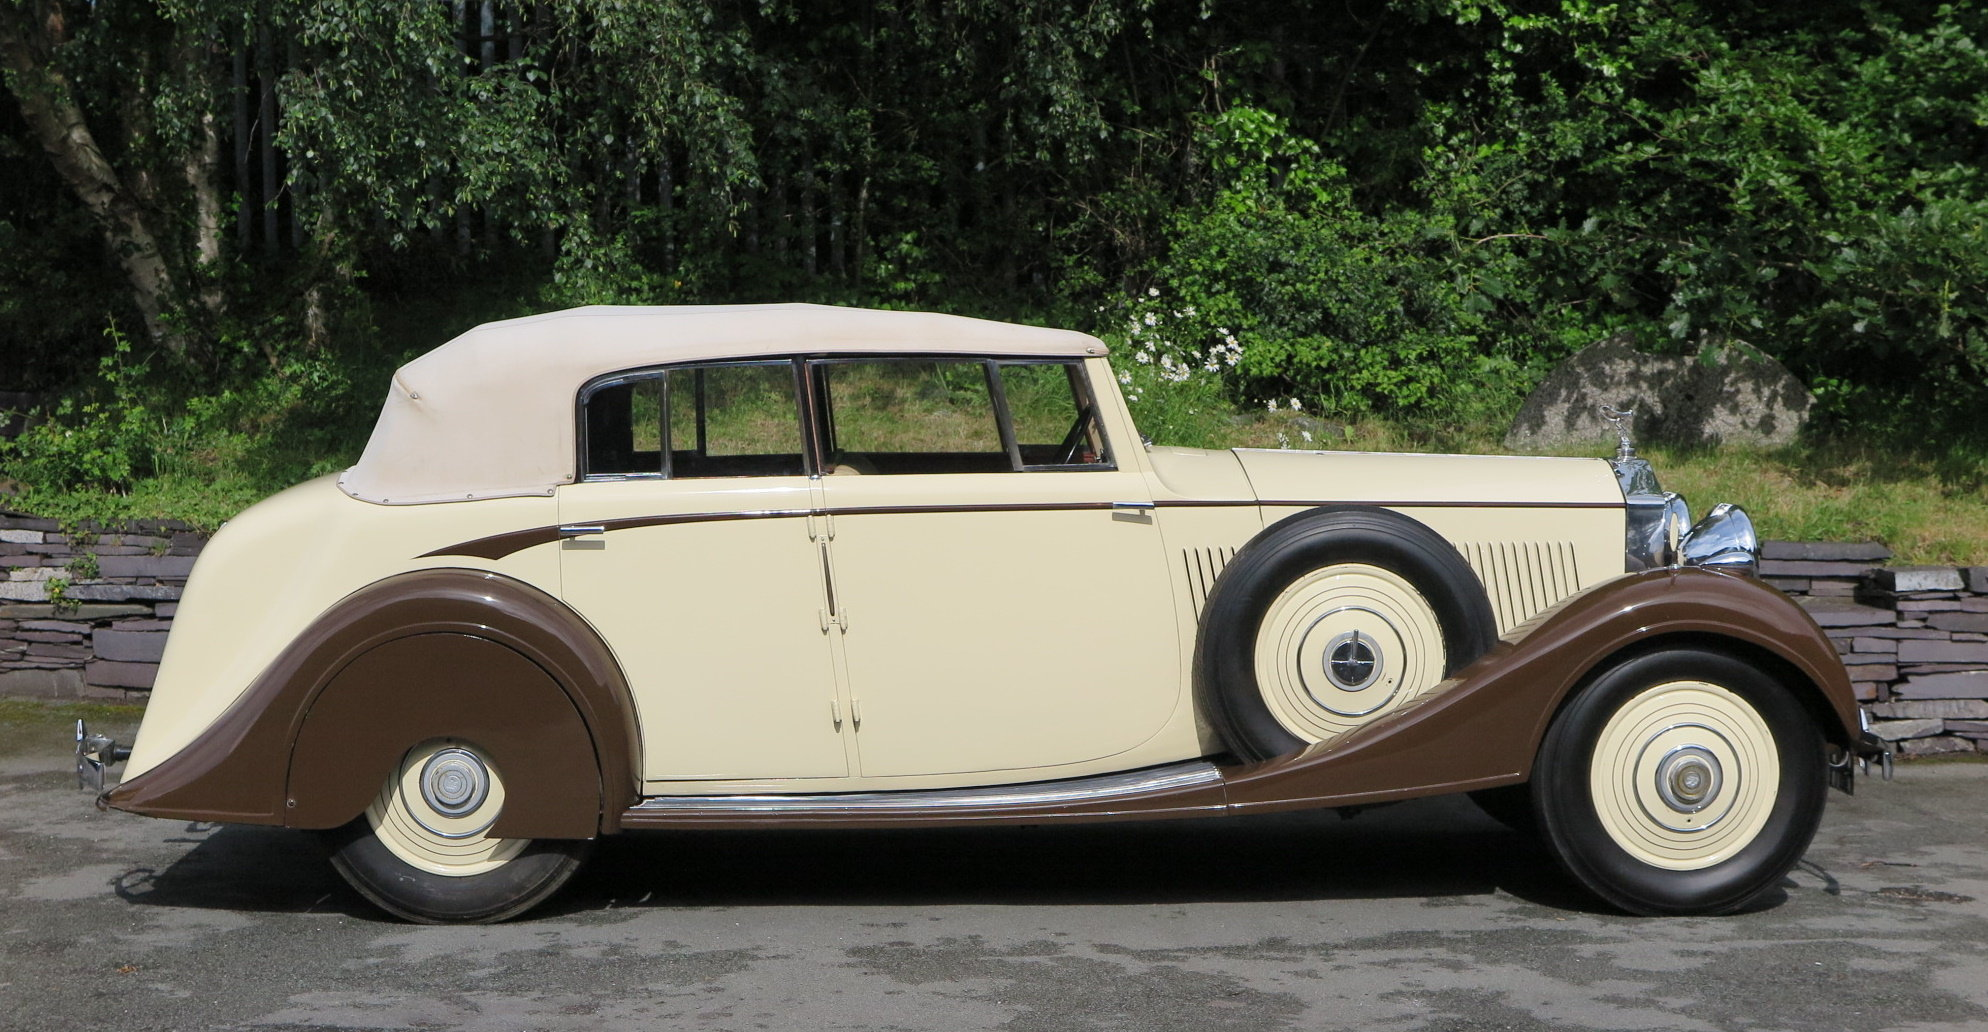 1938 Rolls-Royce 25/30 Park Ward 4 Dr  Cabriolet GGR54 For Sale (picture 2 of 6)